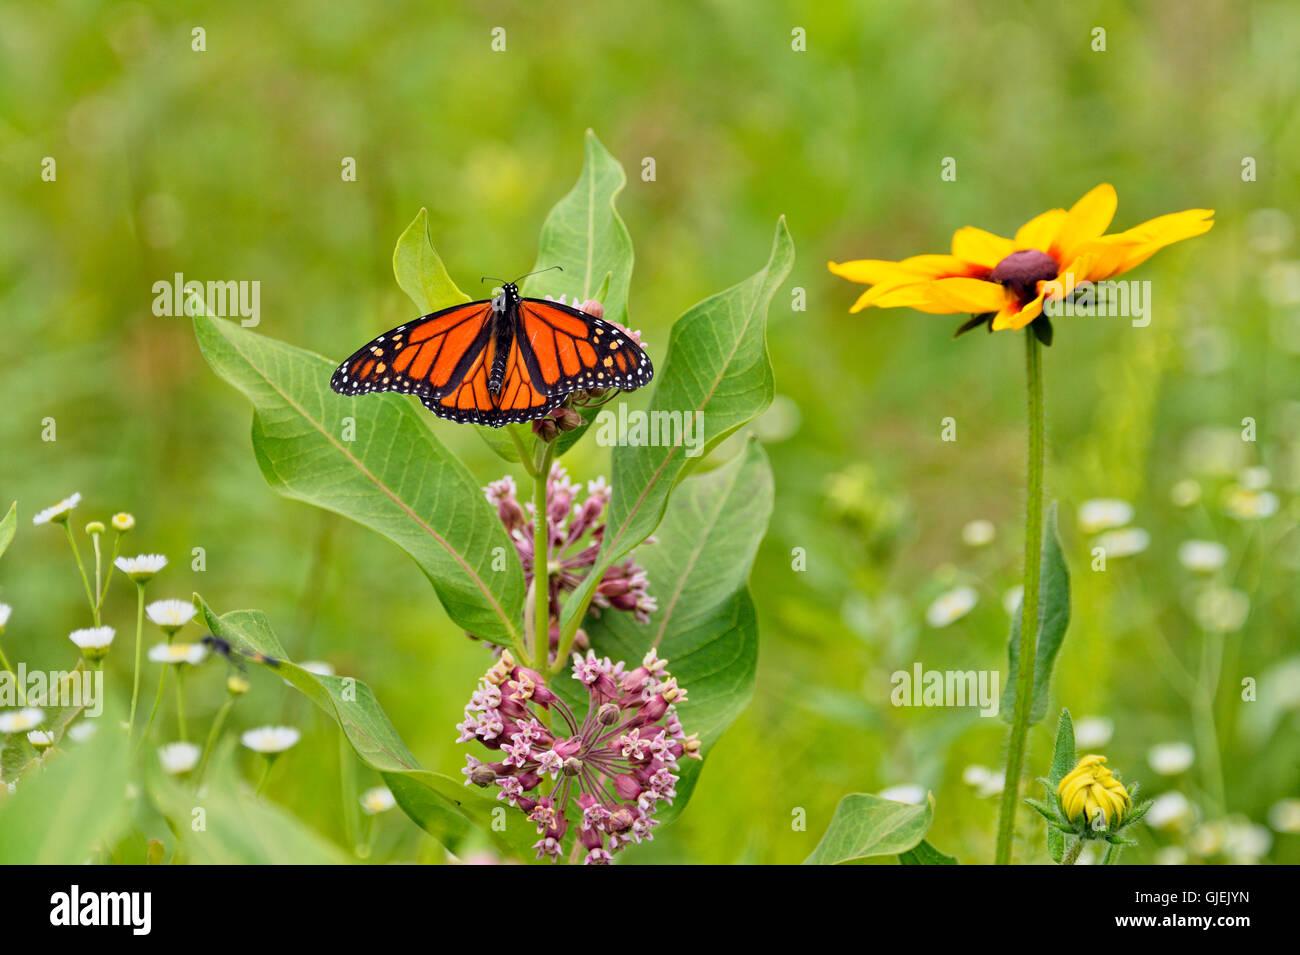 Monarch (Danaus plexippus) nectaring host milkweed flowers, Greater Sudbury, Ontario, Canada - Stock Image